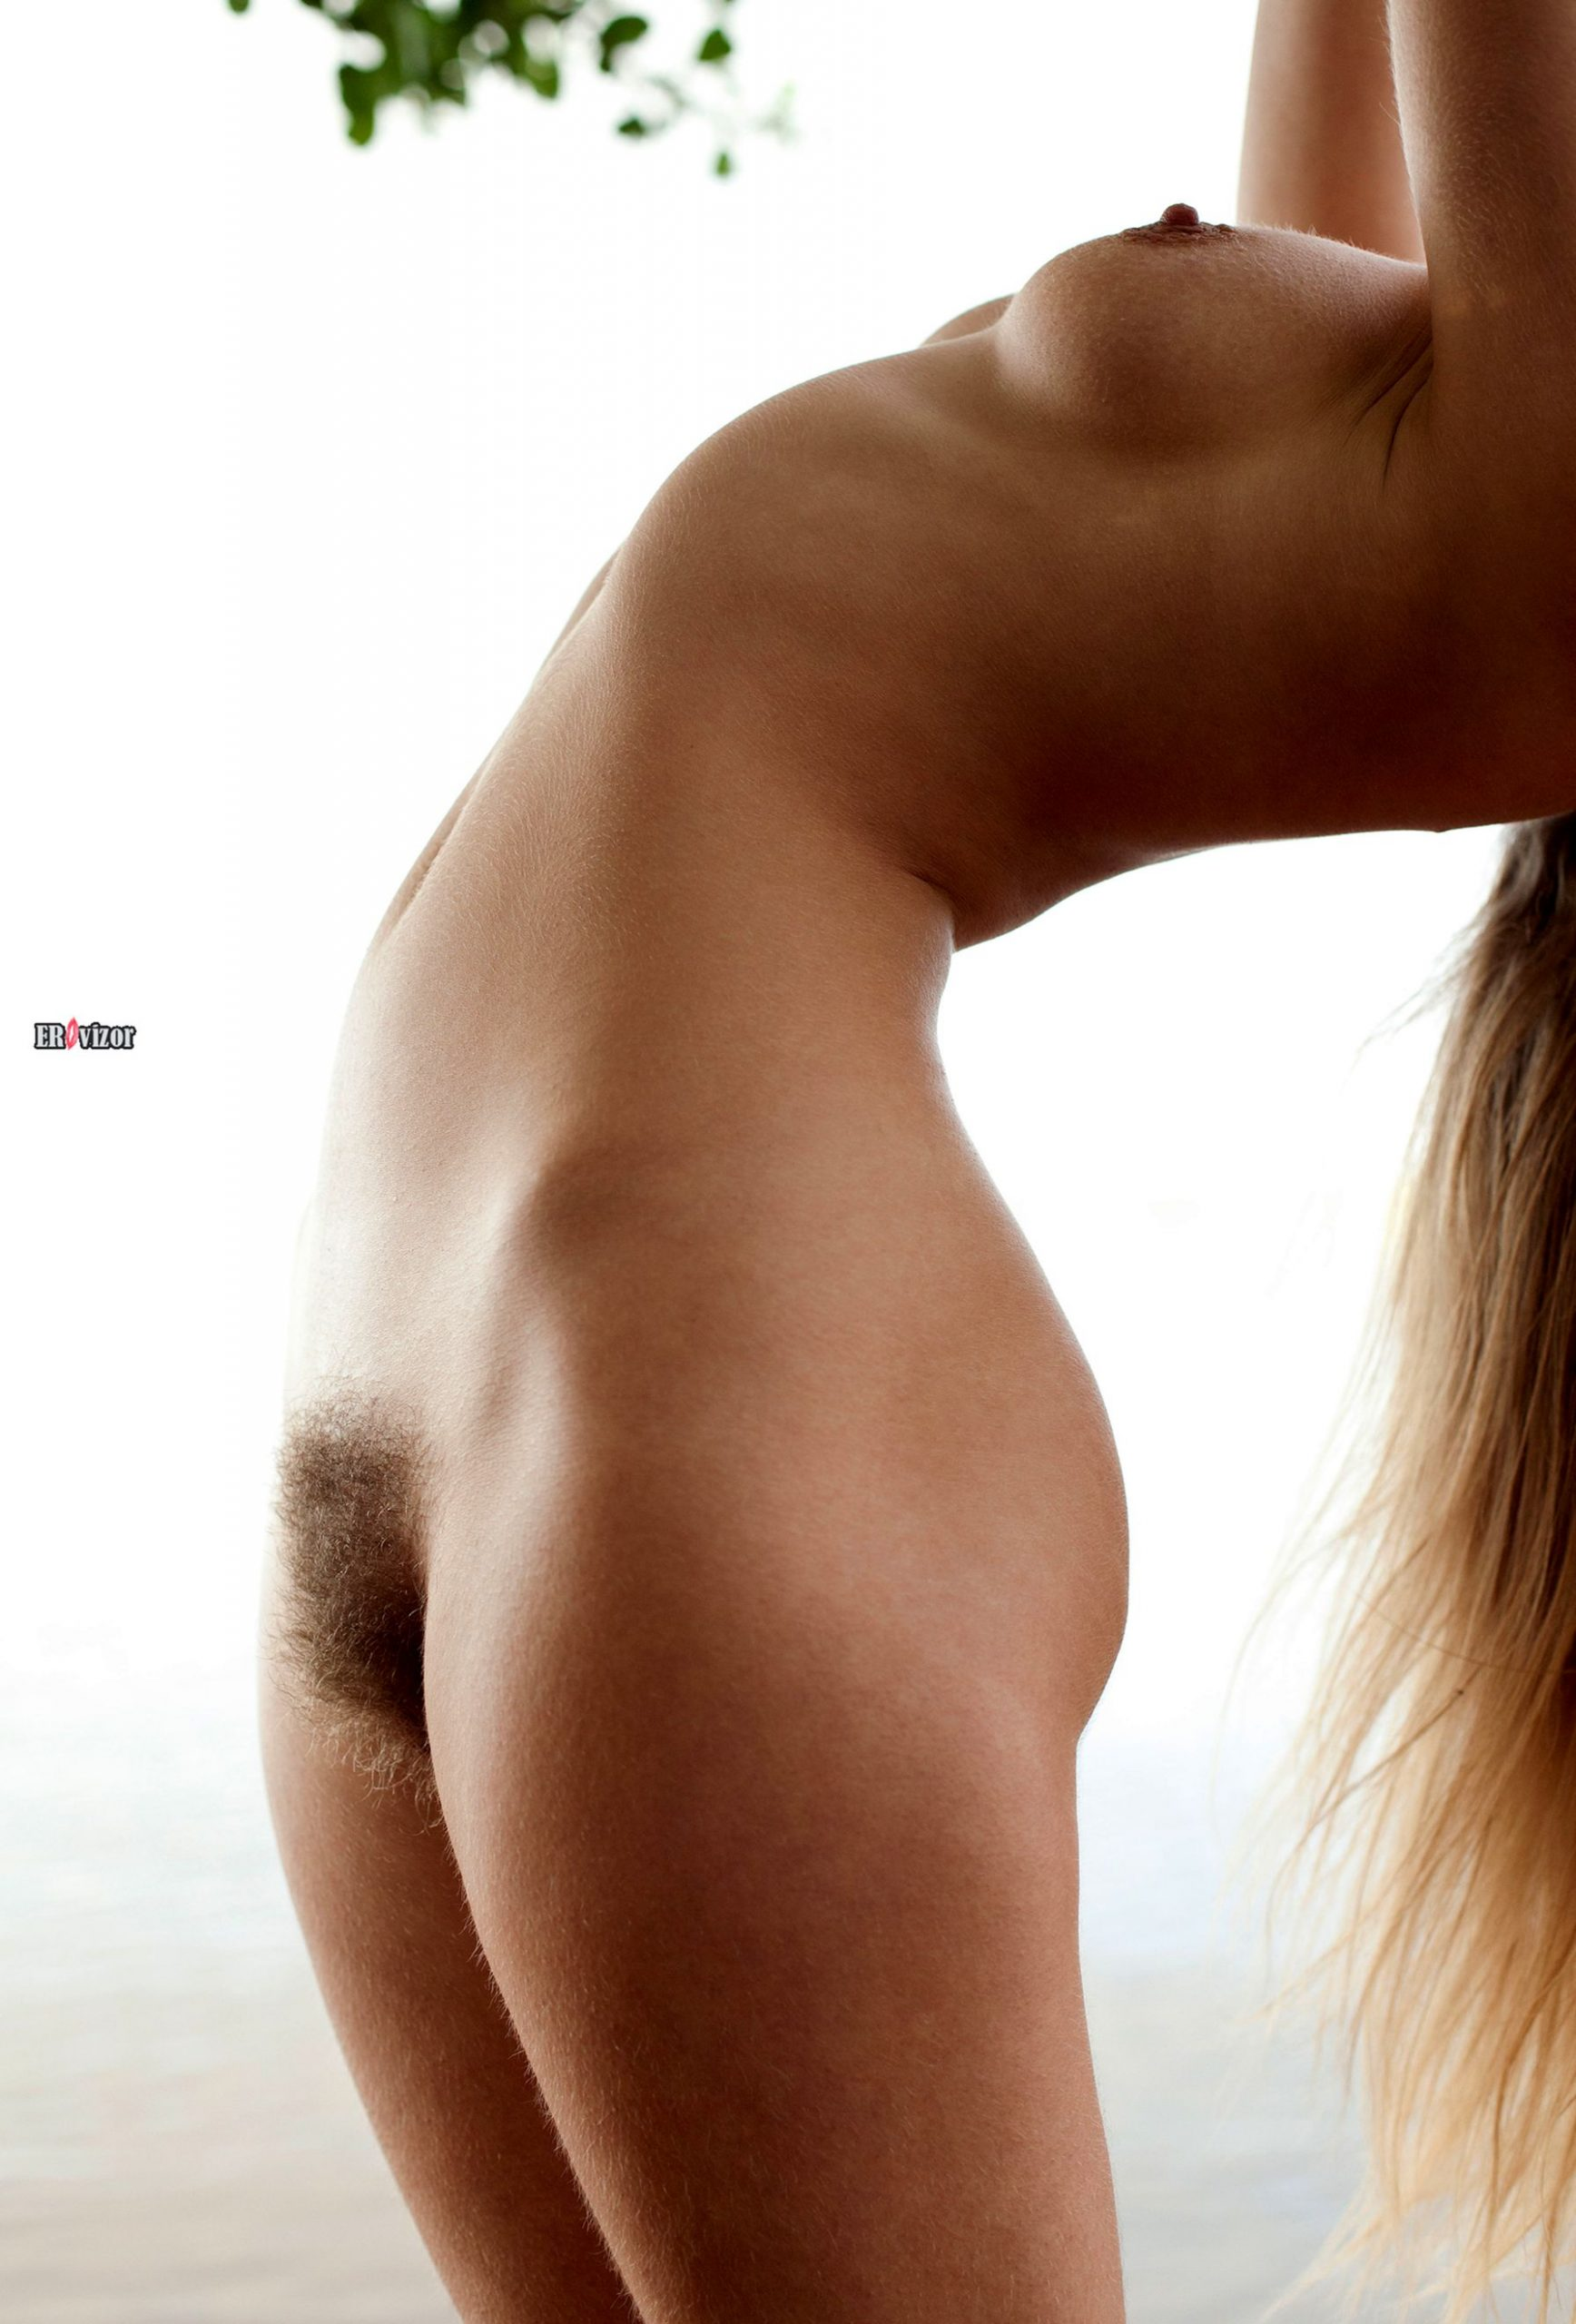 adele_naked_acrobatic-erovizor-12